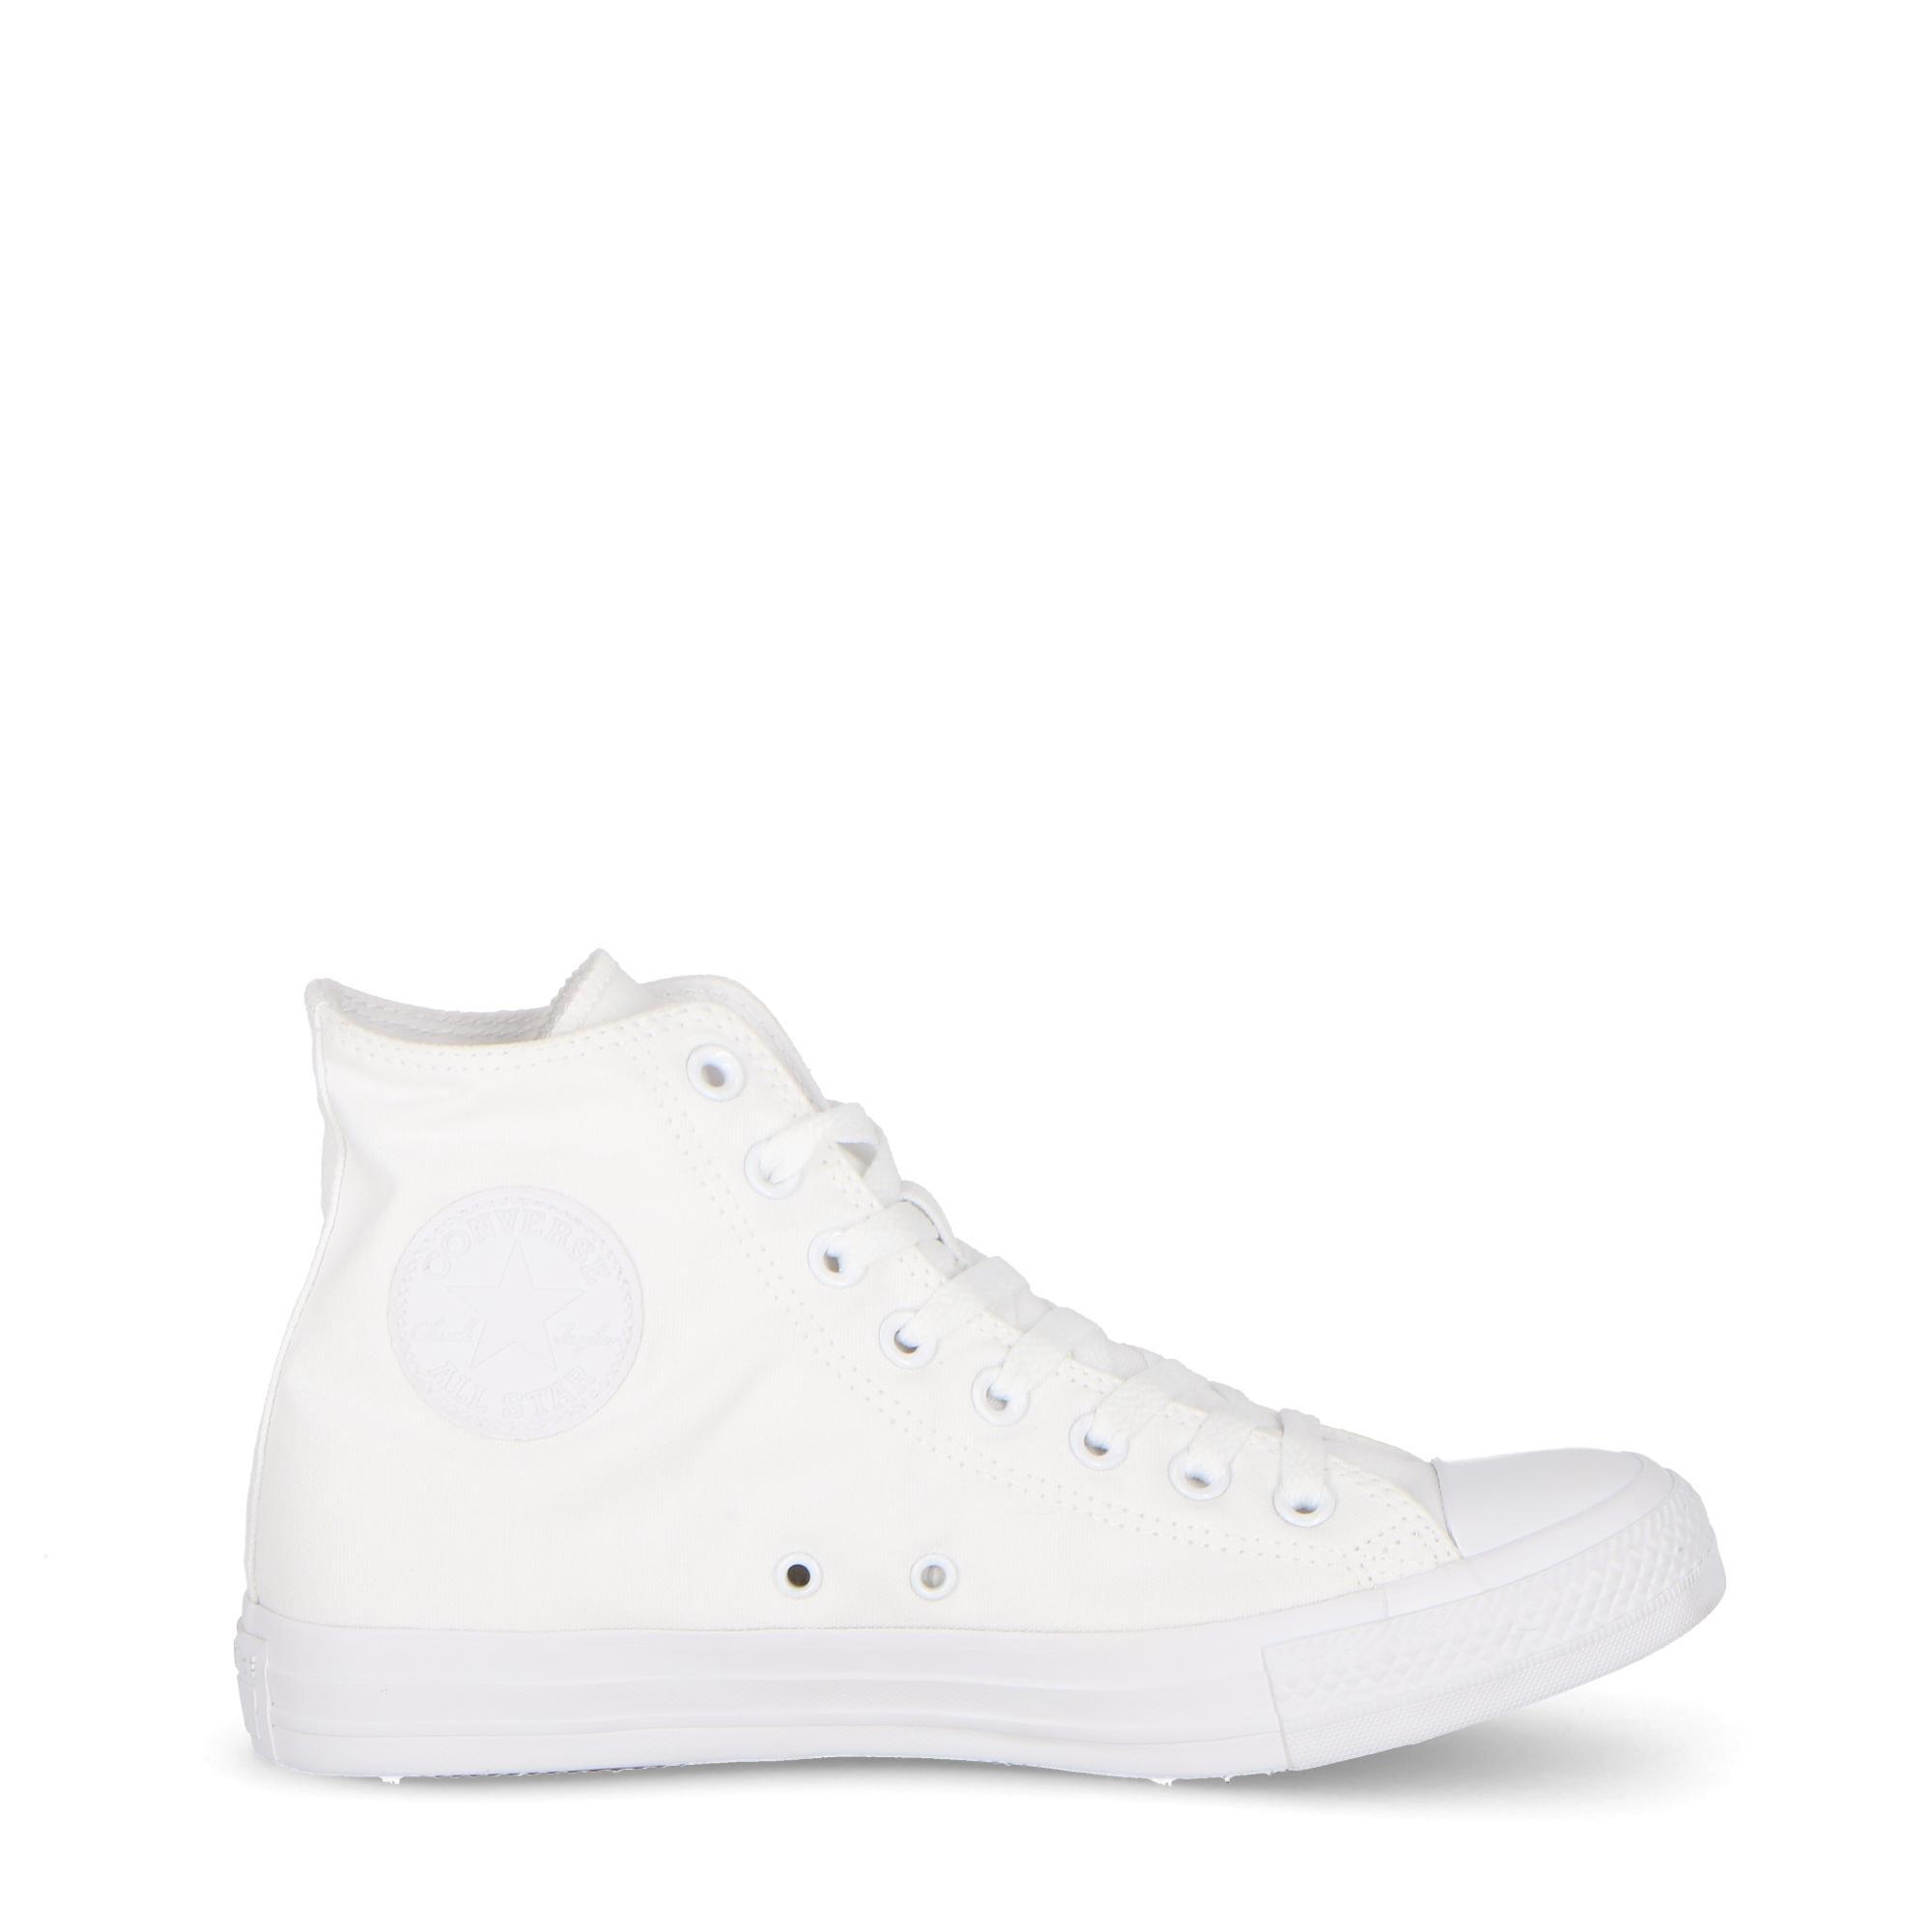 Converse Chuck Taylor All Star Hi white monochrome (1U646